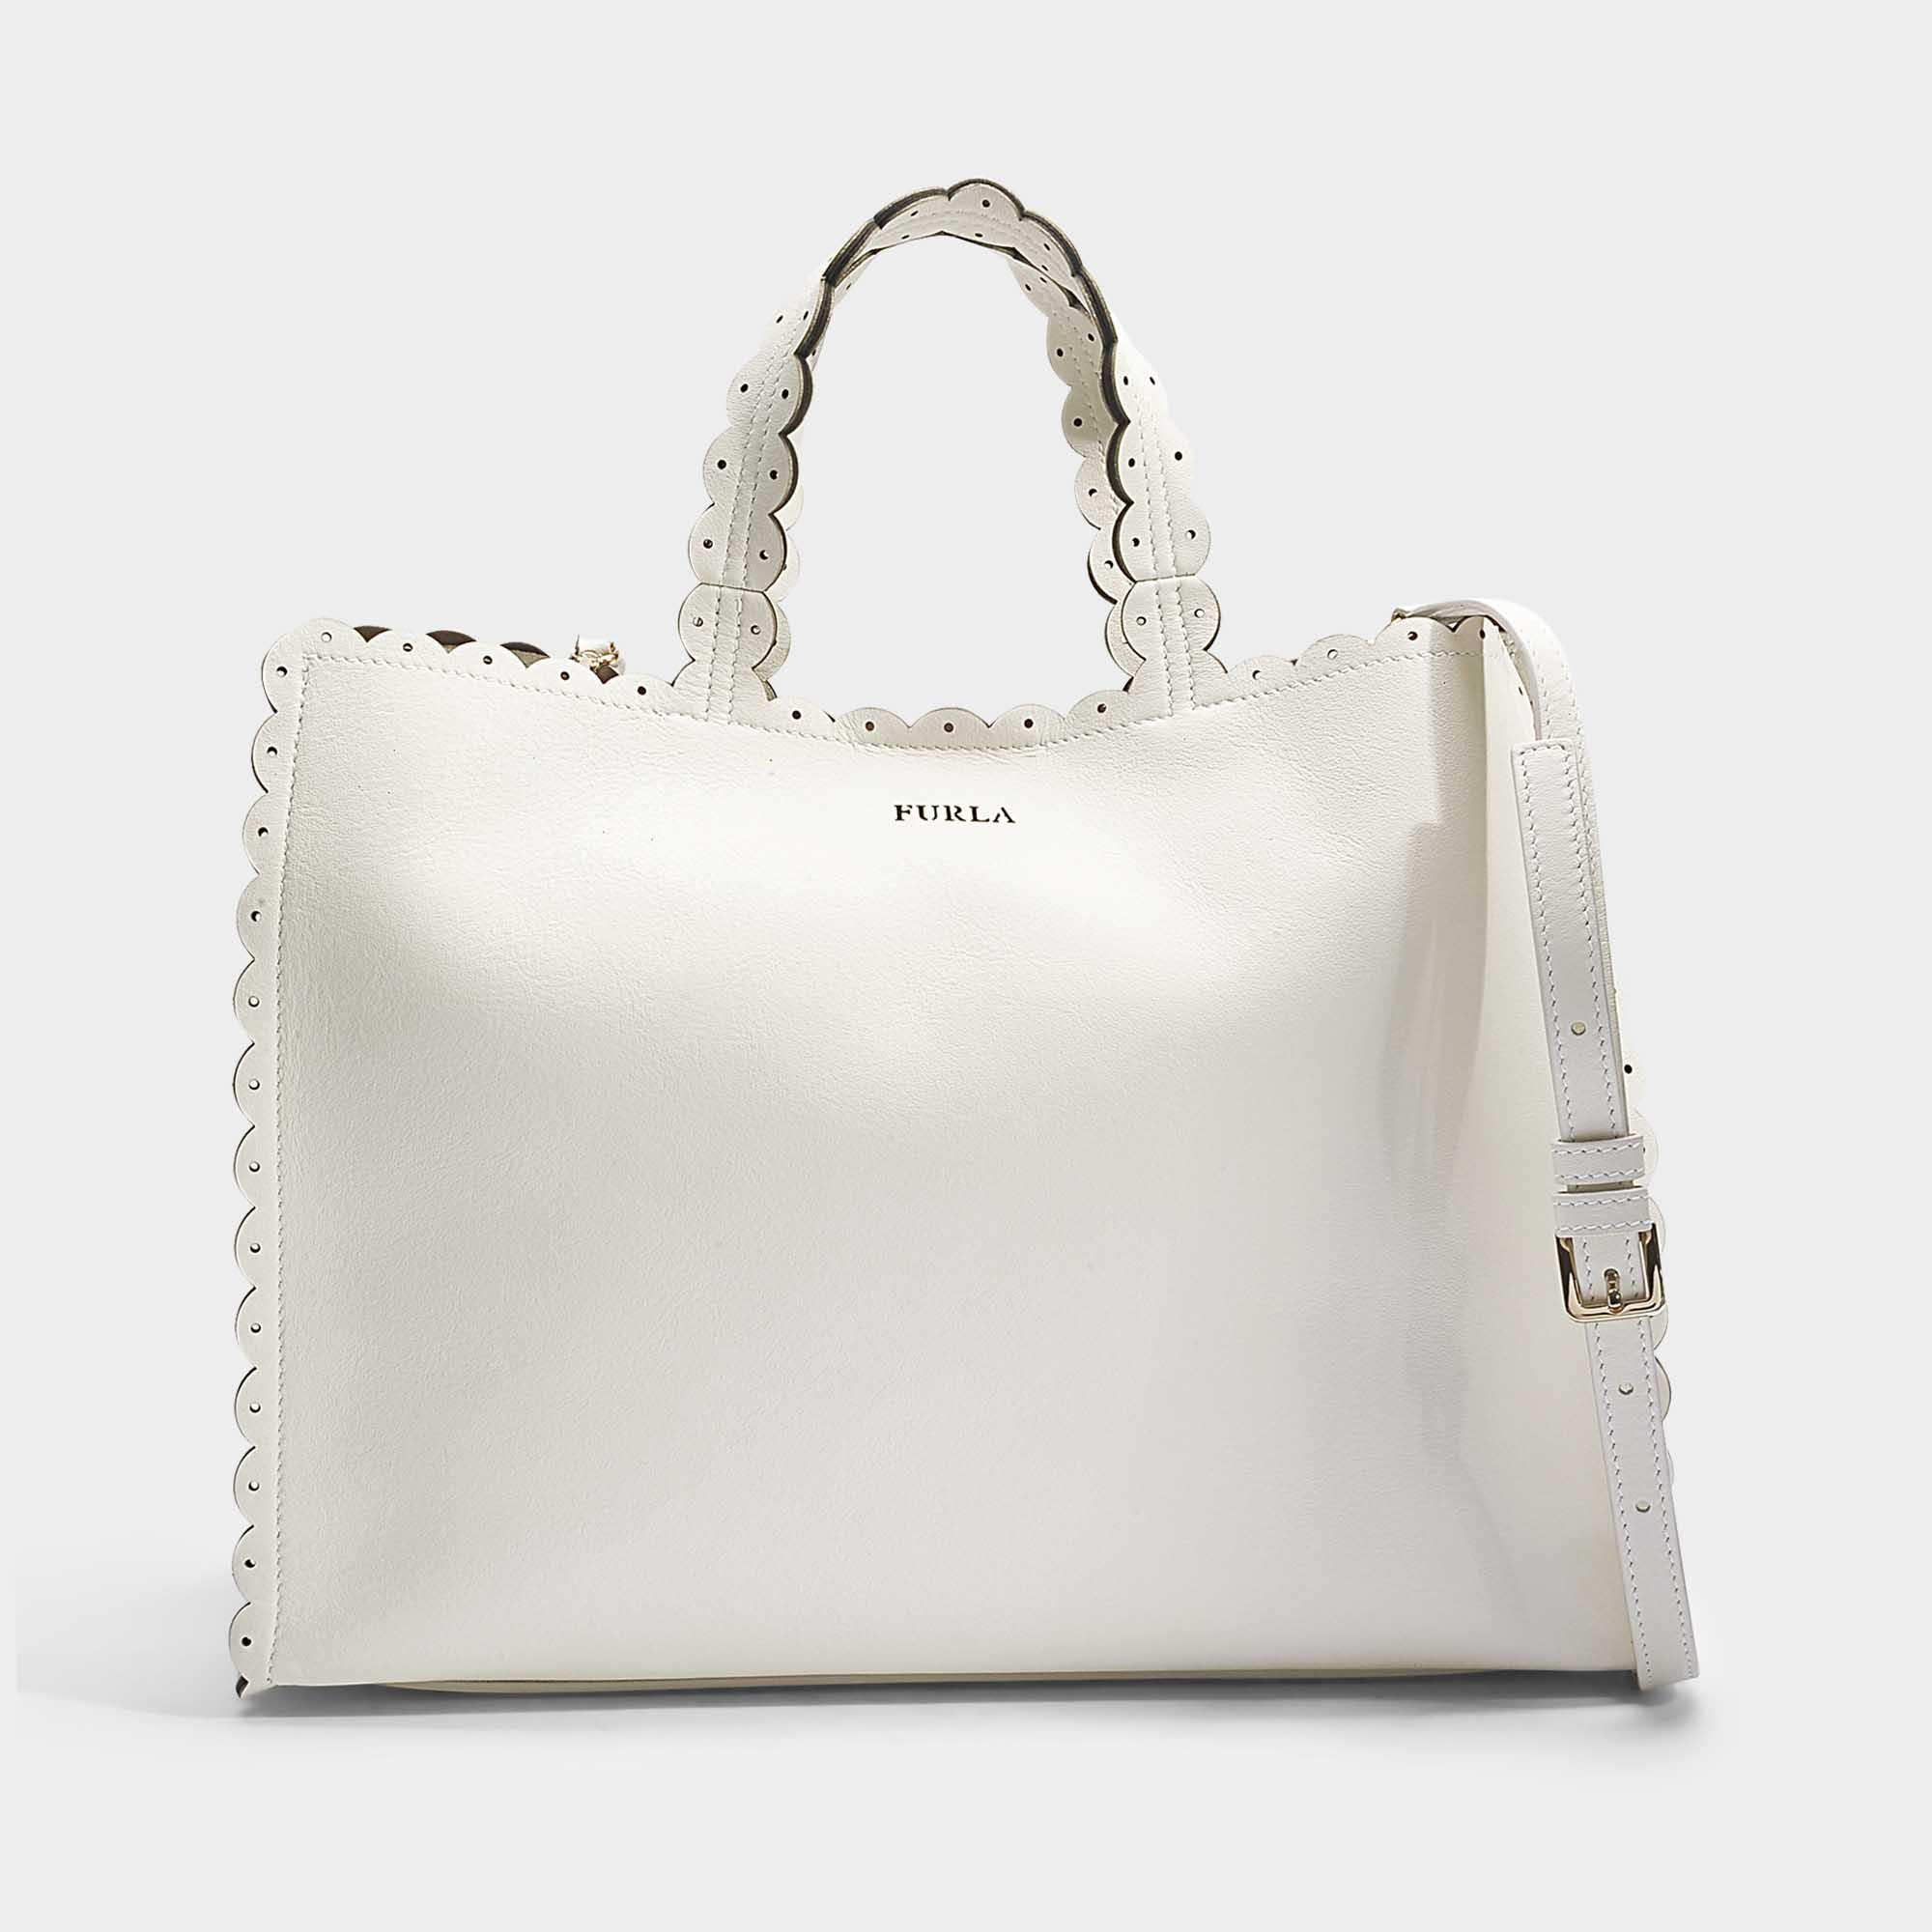 8253ec13c2 Furla - Multicolor Merletto Large Tote Bag In Petalo Calfskin - Lyst